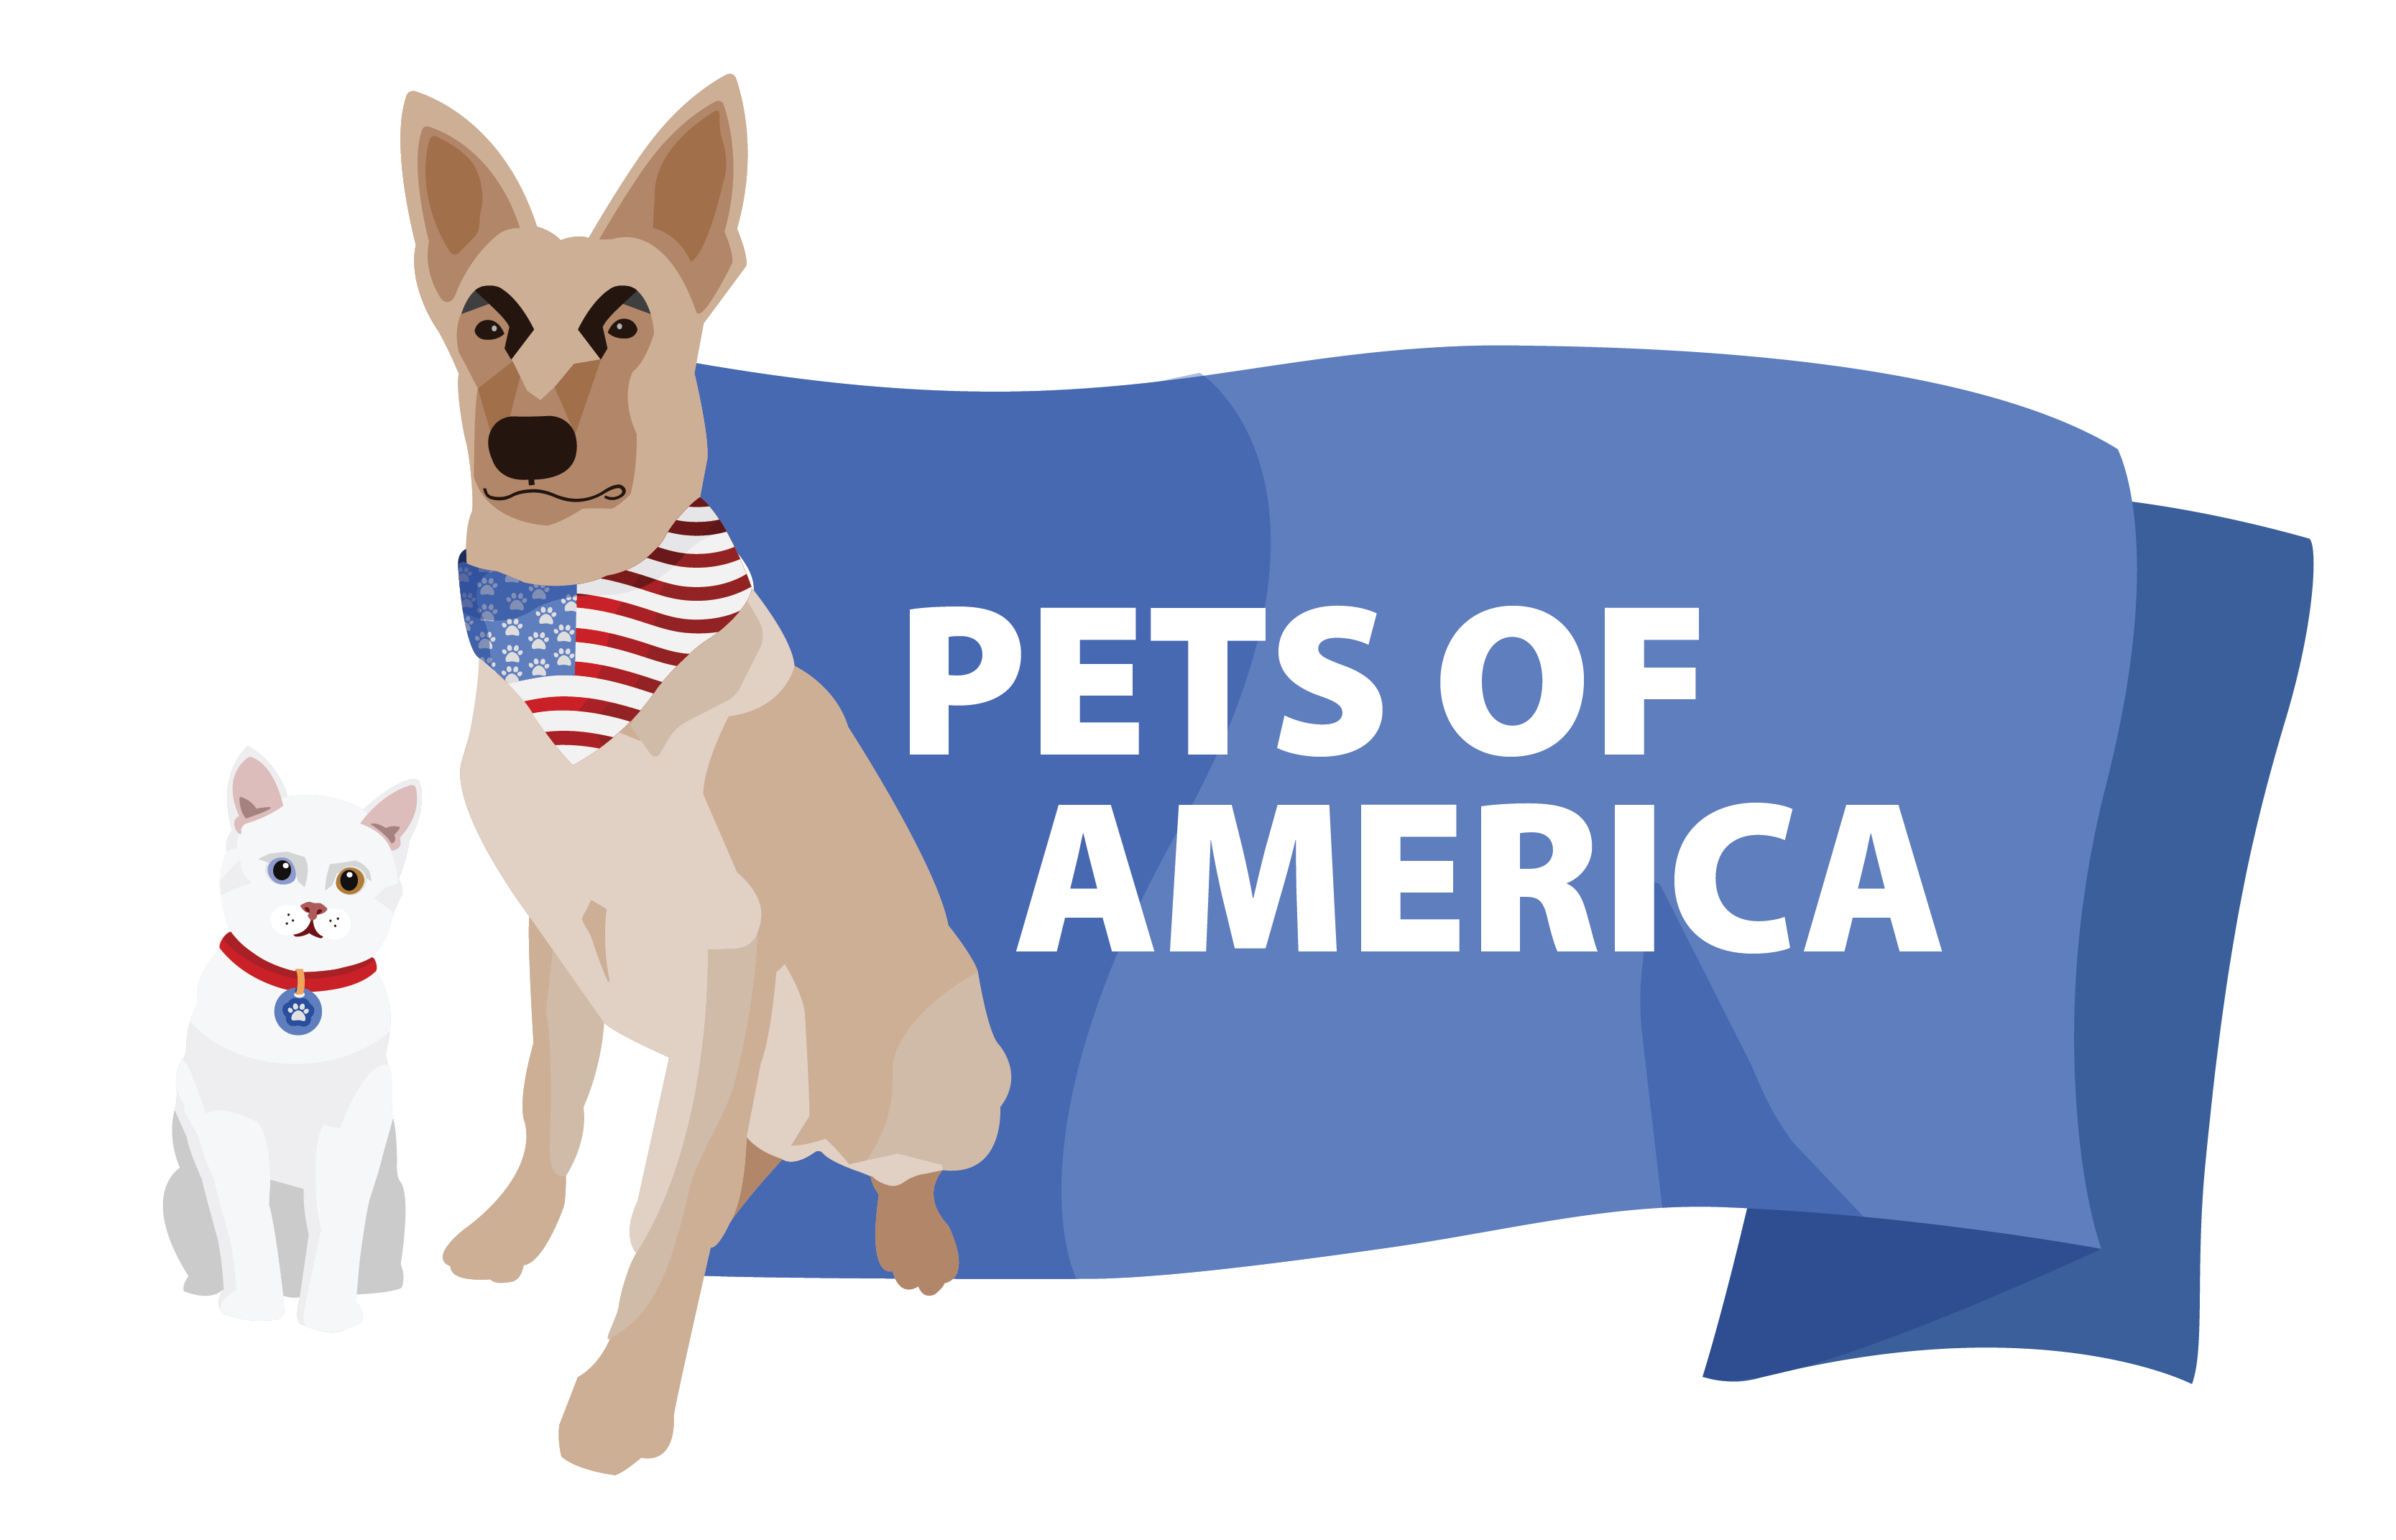 Pets of America